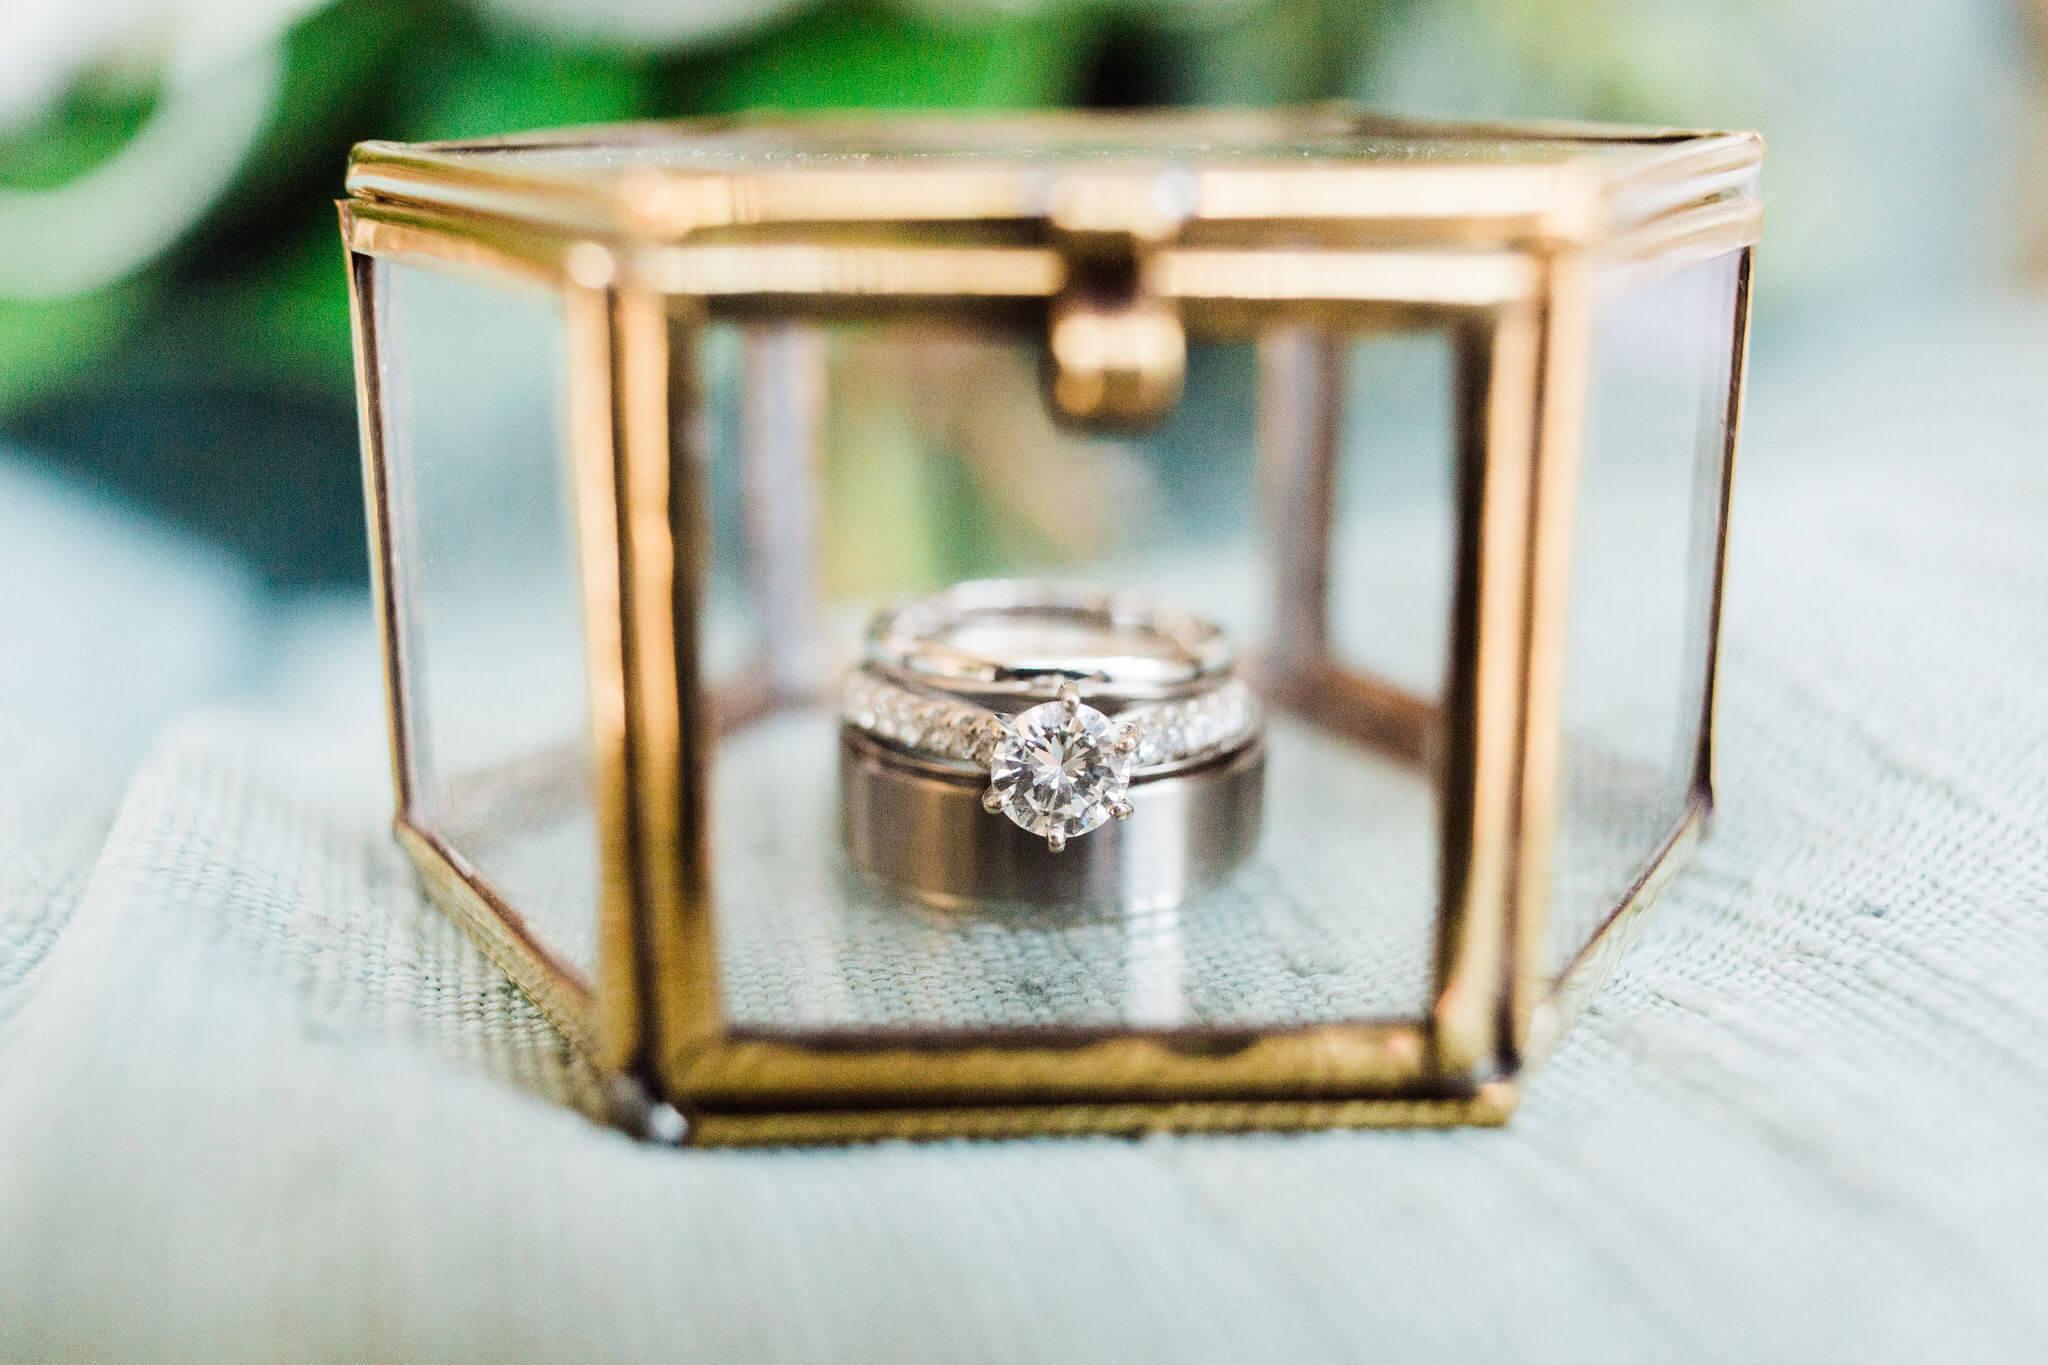 apt-b-photography-savannah-wedding-photographer-savannah-wedding-savannah-elopement-intimate-wedding-photographer-93.JPG